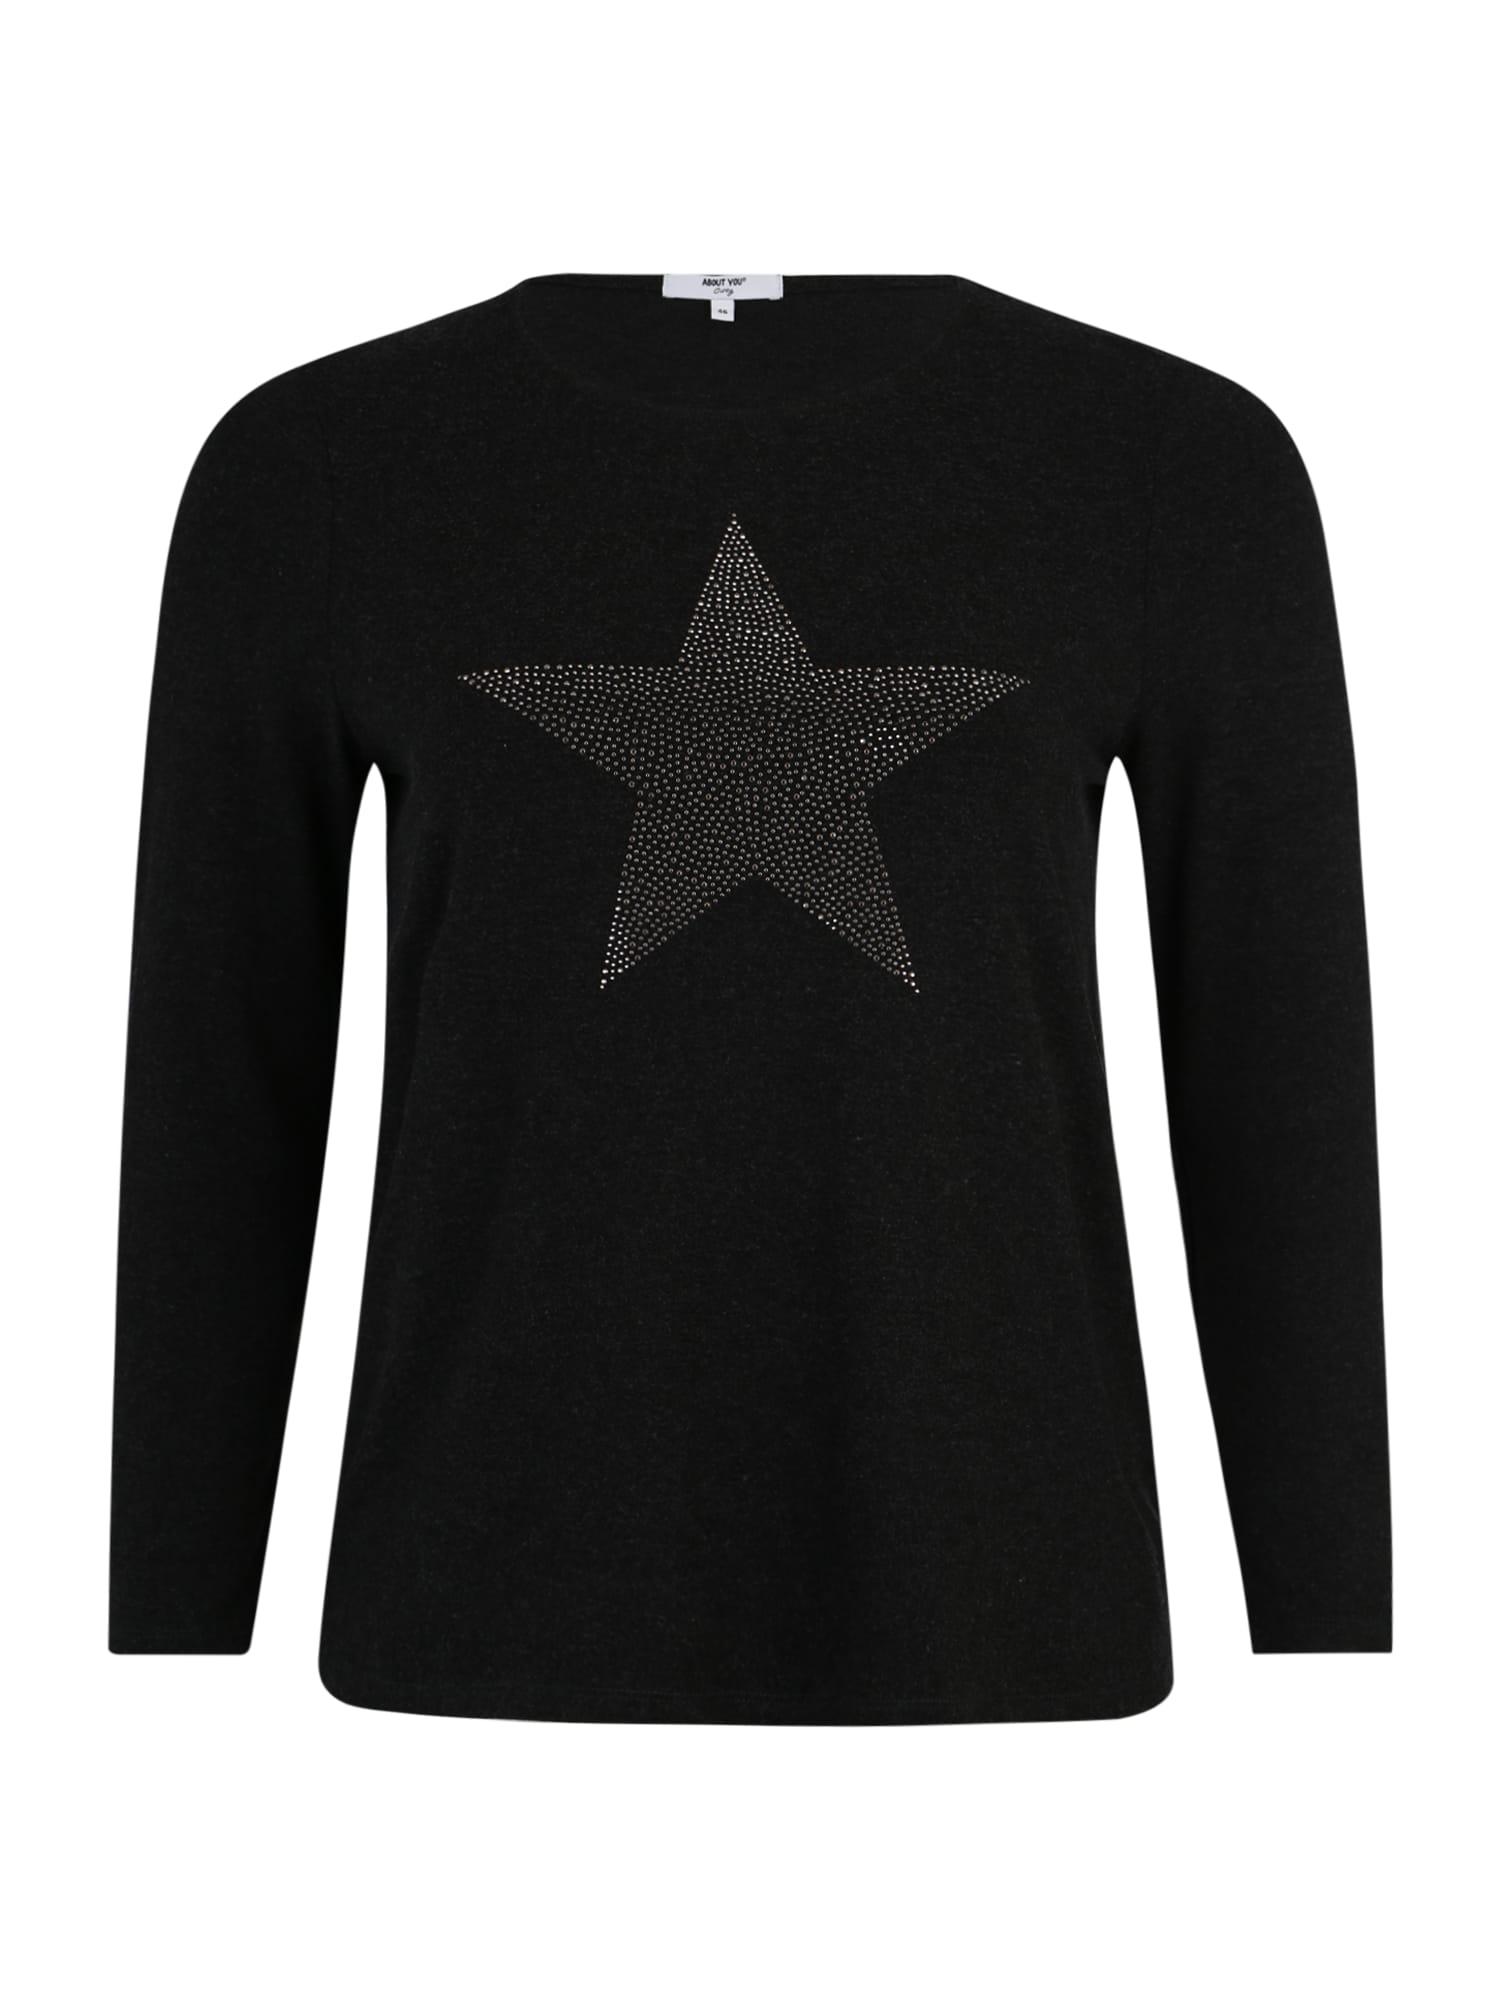 ABOUT YOU Curvy Marškinėliai 'Lisa' tamsiai pilka